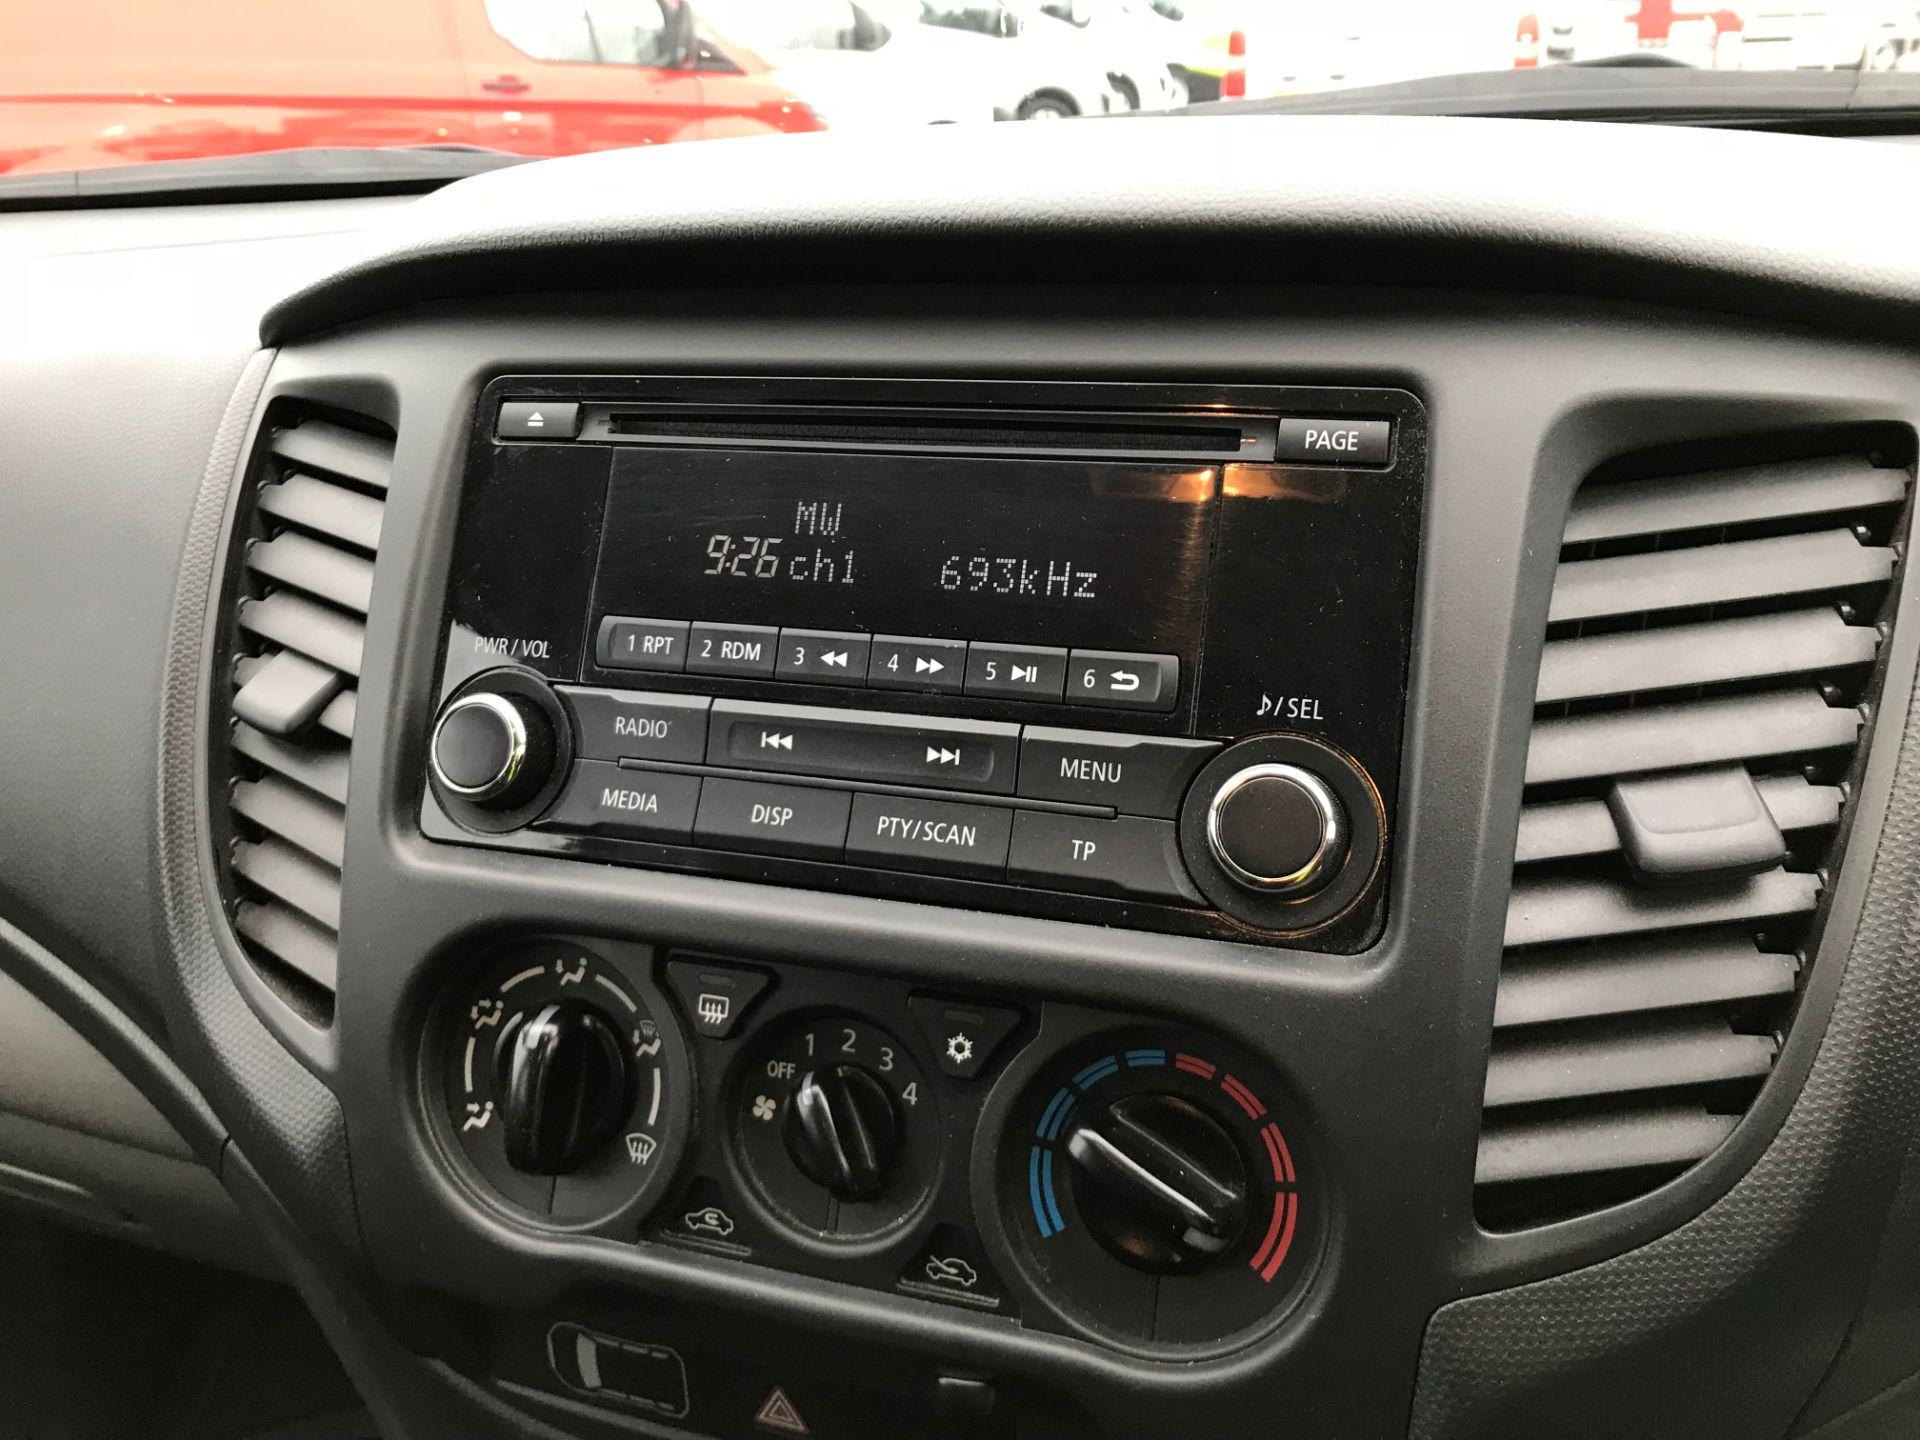 2016 Mitsubishi L200 Double Cab Di-D 151 4Life 4Wd (DV66VPT) Image 13